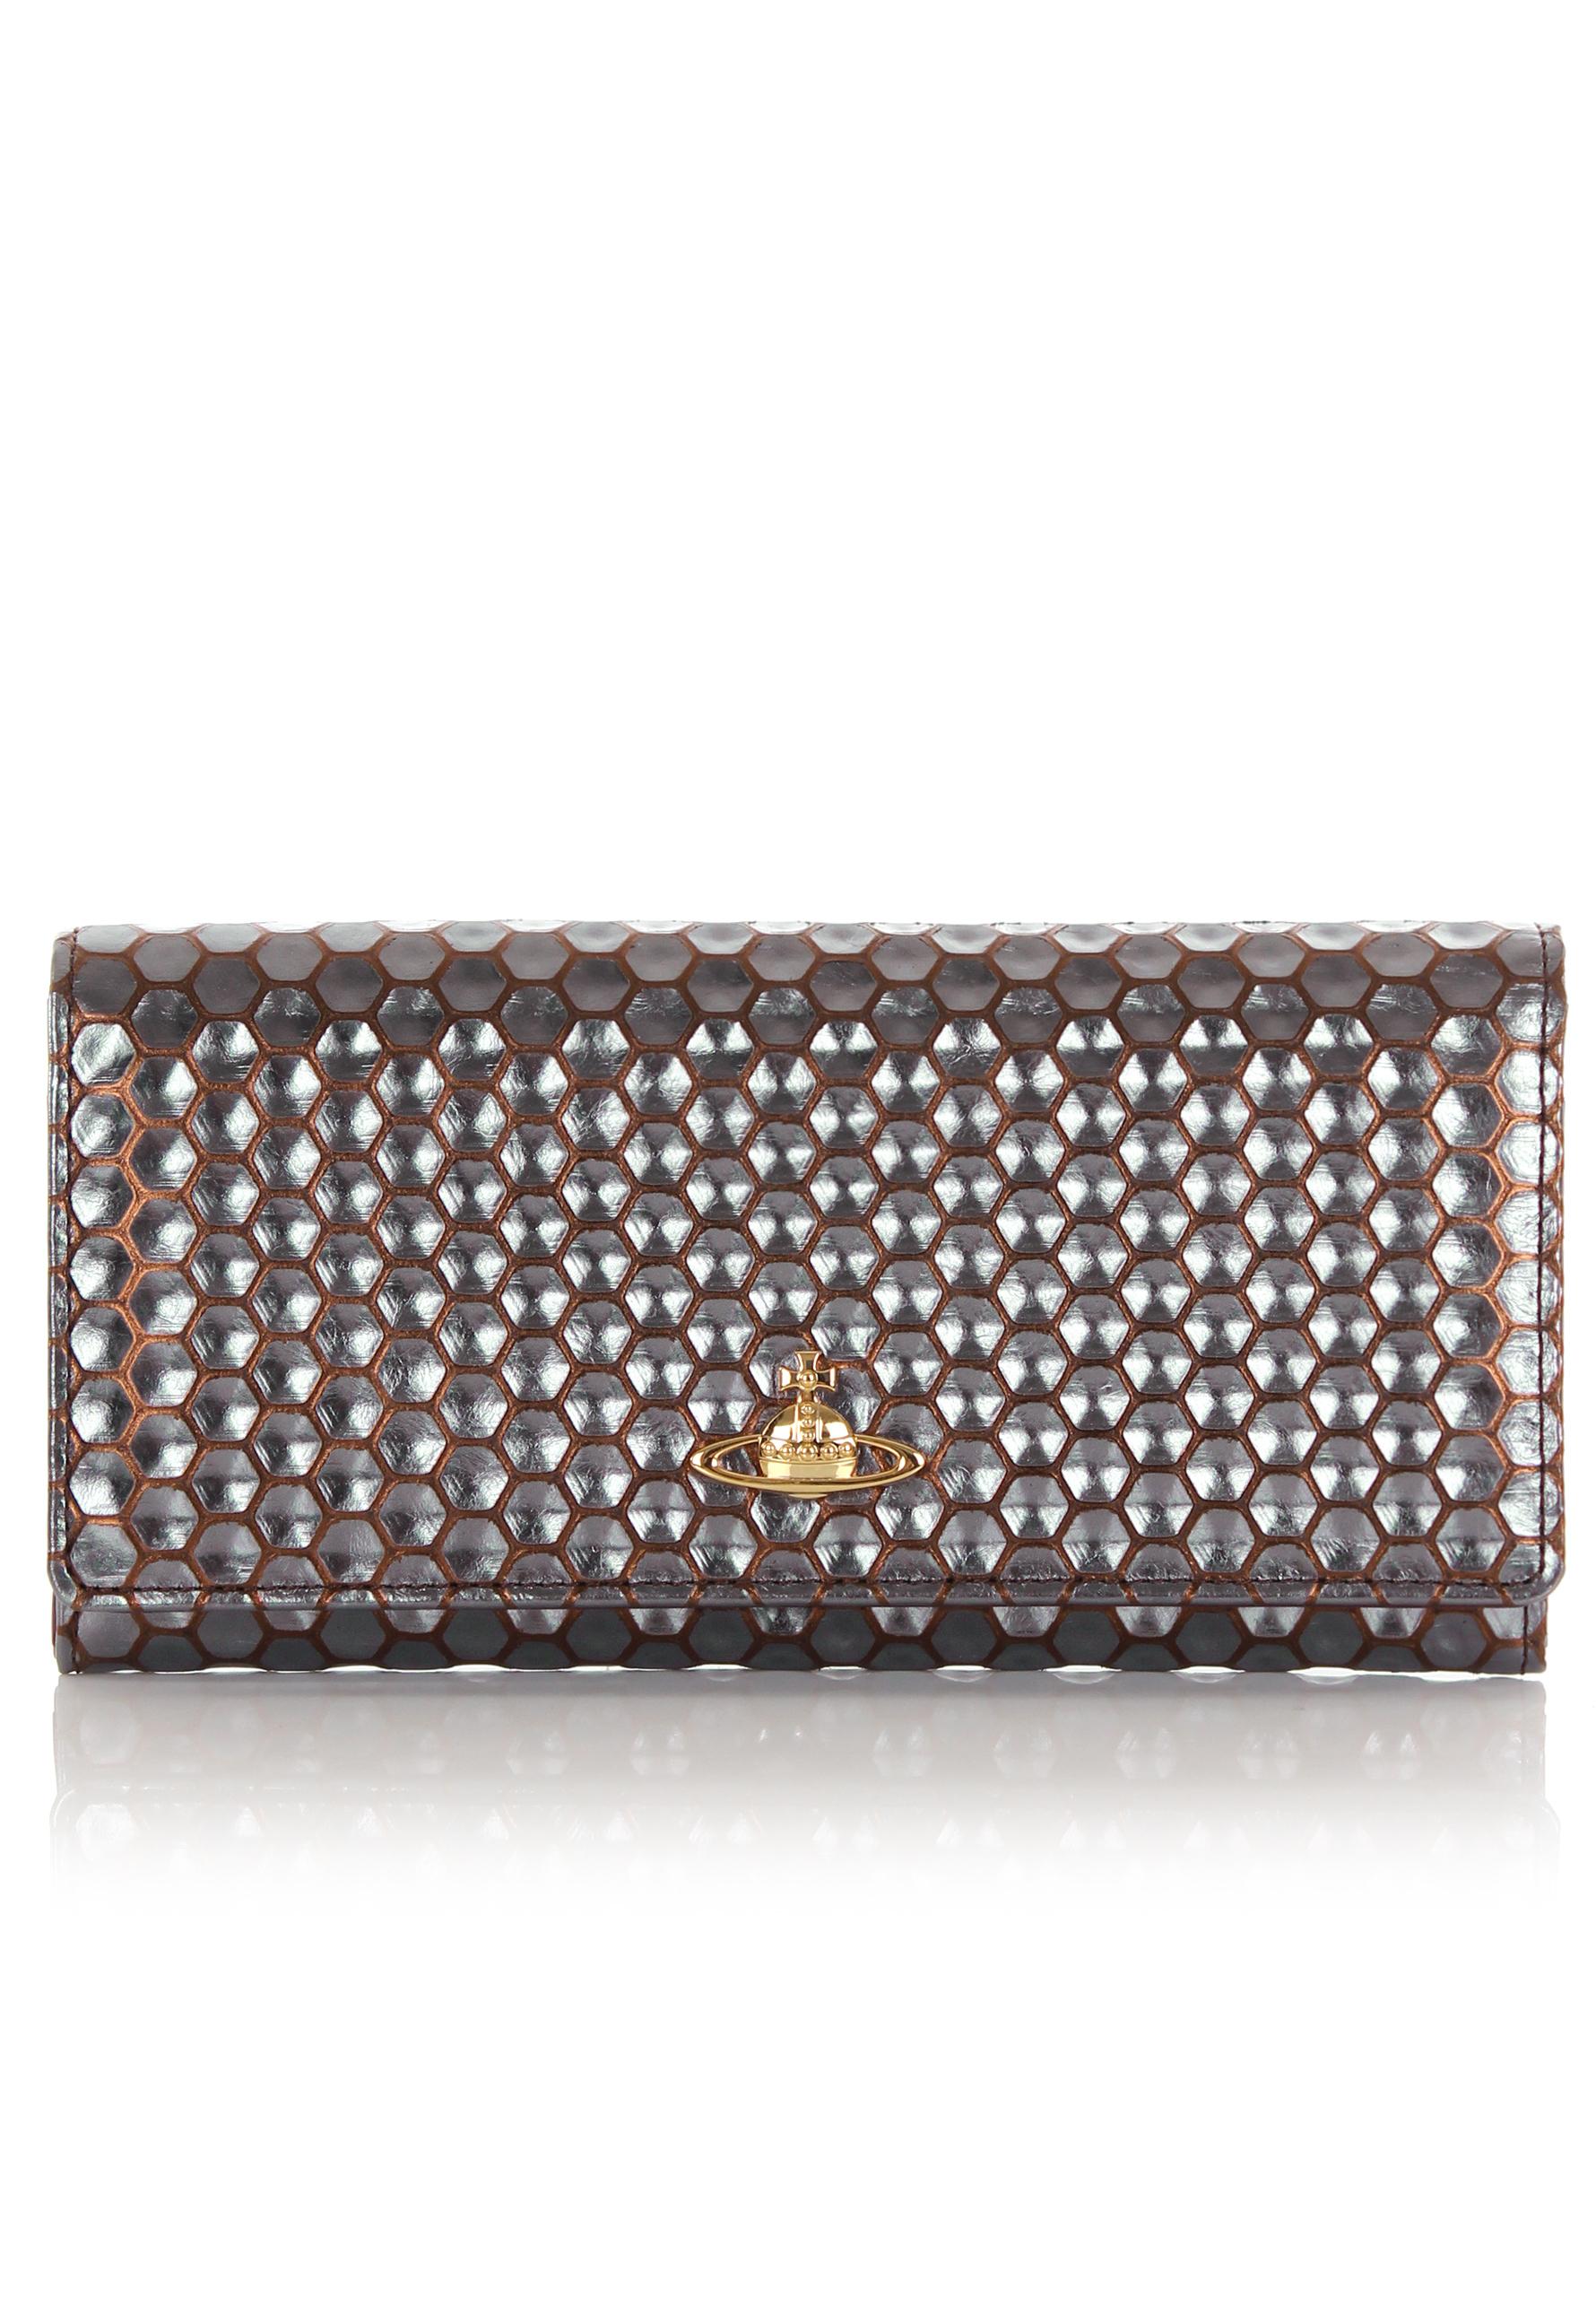 b1fb8540695 Vivienne Westwood Honeycomb 2800 Long Purse Bronze in Metallic - Lyst